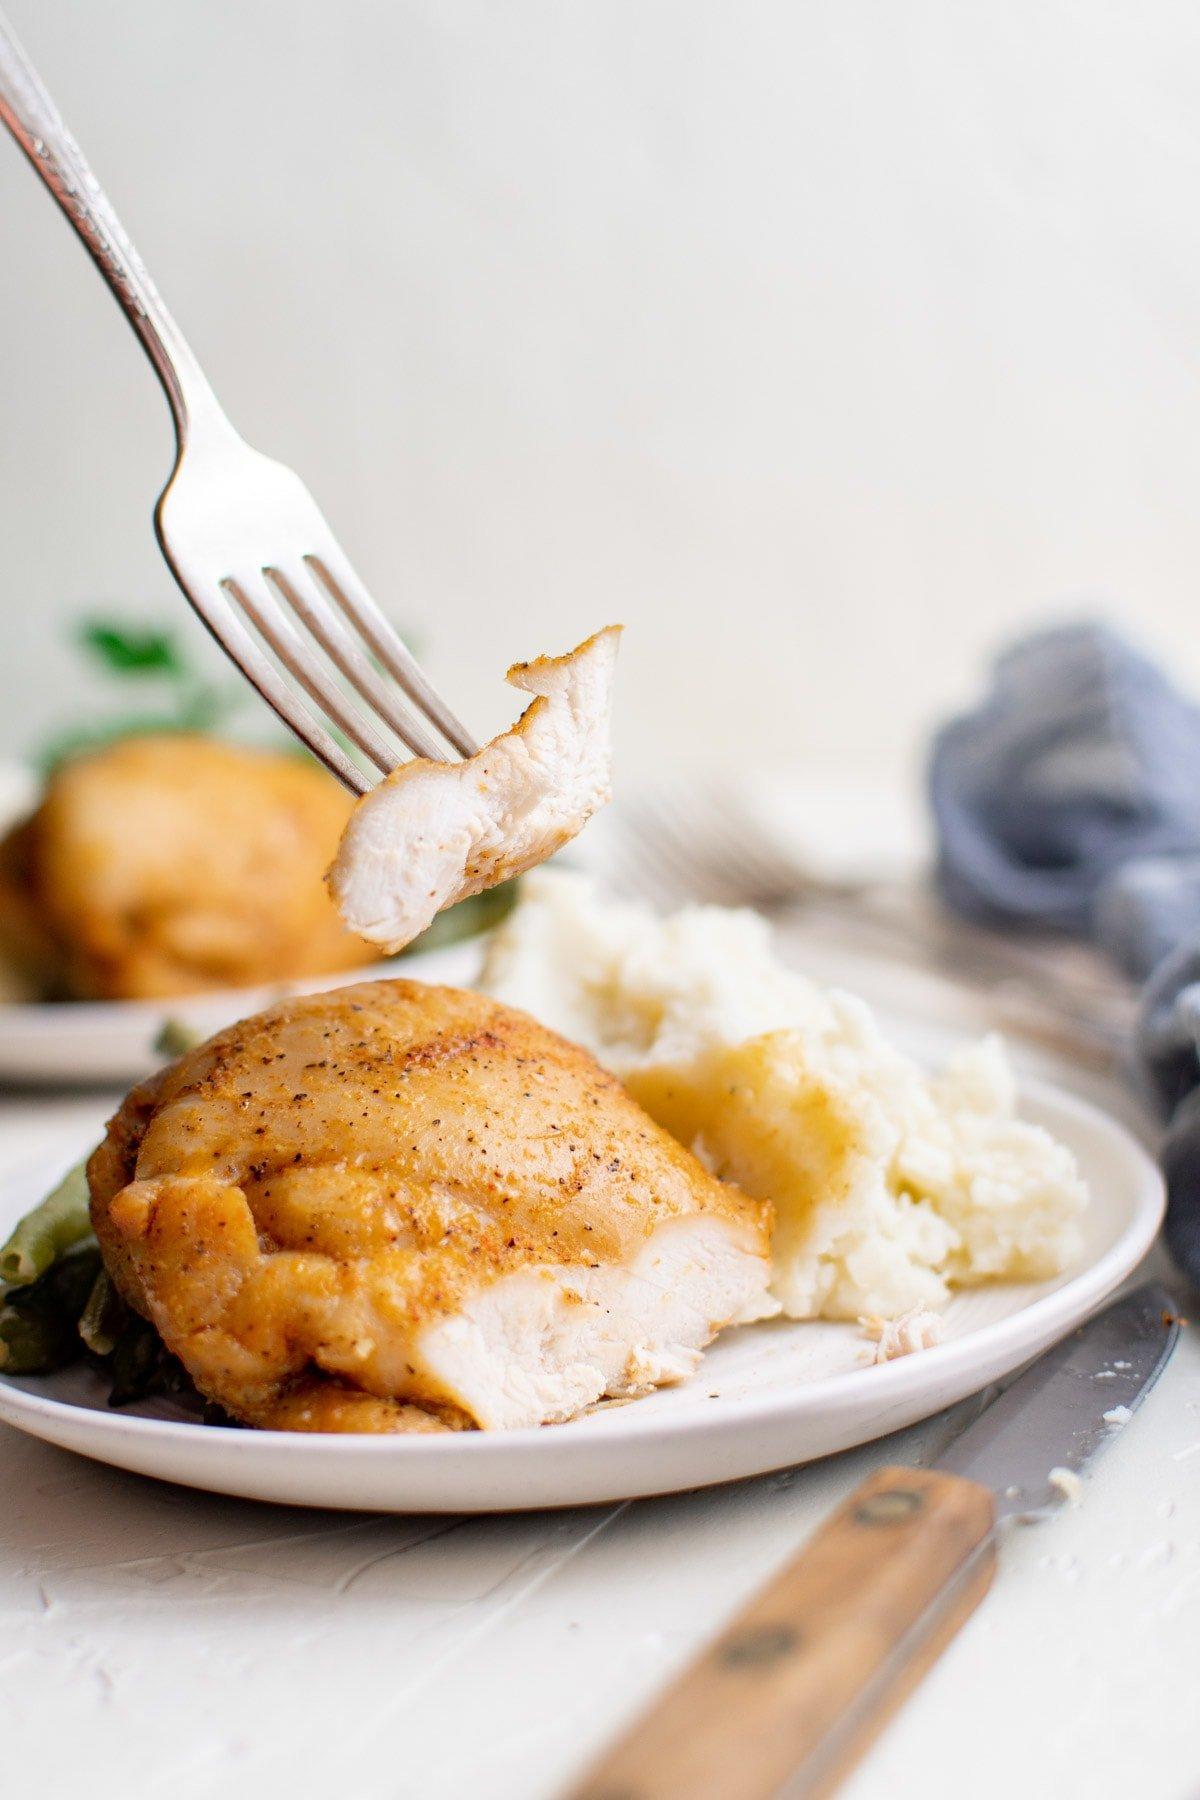 bonelss chicken thighs, sliced fork